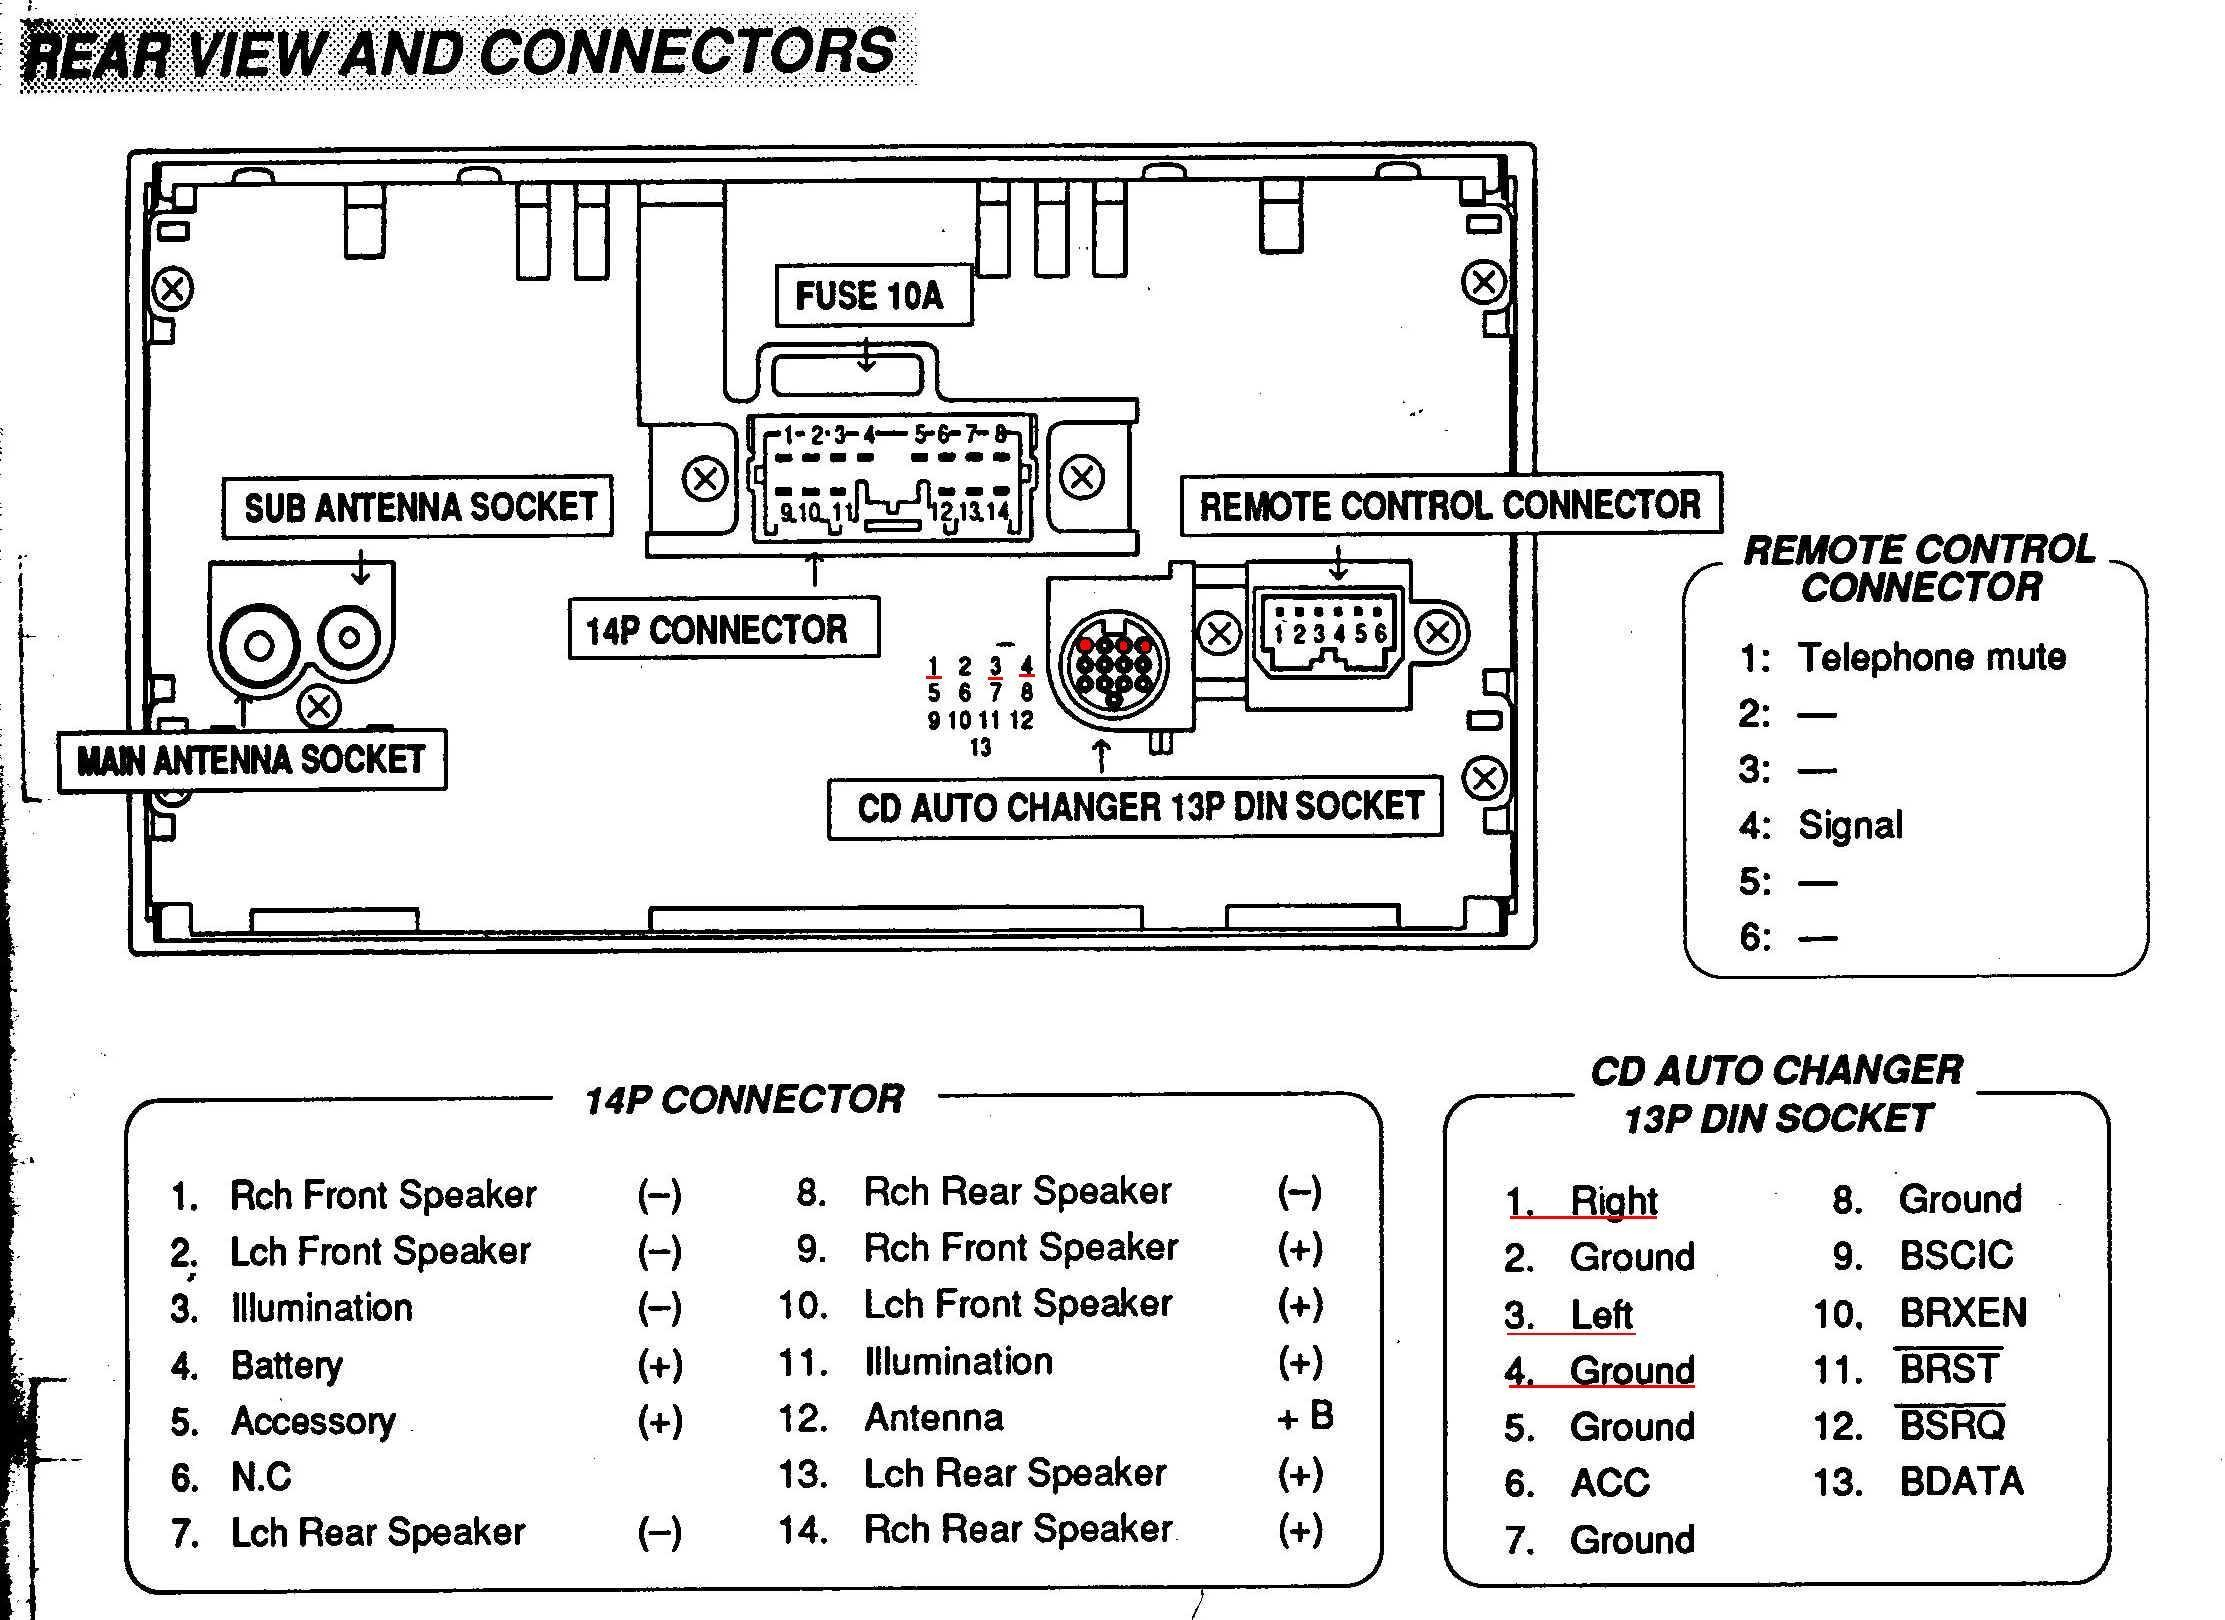 2000 mitsubishi eclipse wiring diagram radio wiring diagram for rh detoxicrecenze com 1992 Mitsubishi Montero Wiring-Diagram 02 Mitsubishi Montero Wiring-Diagram